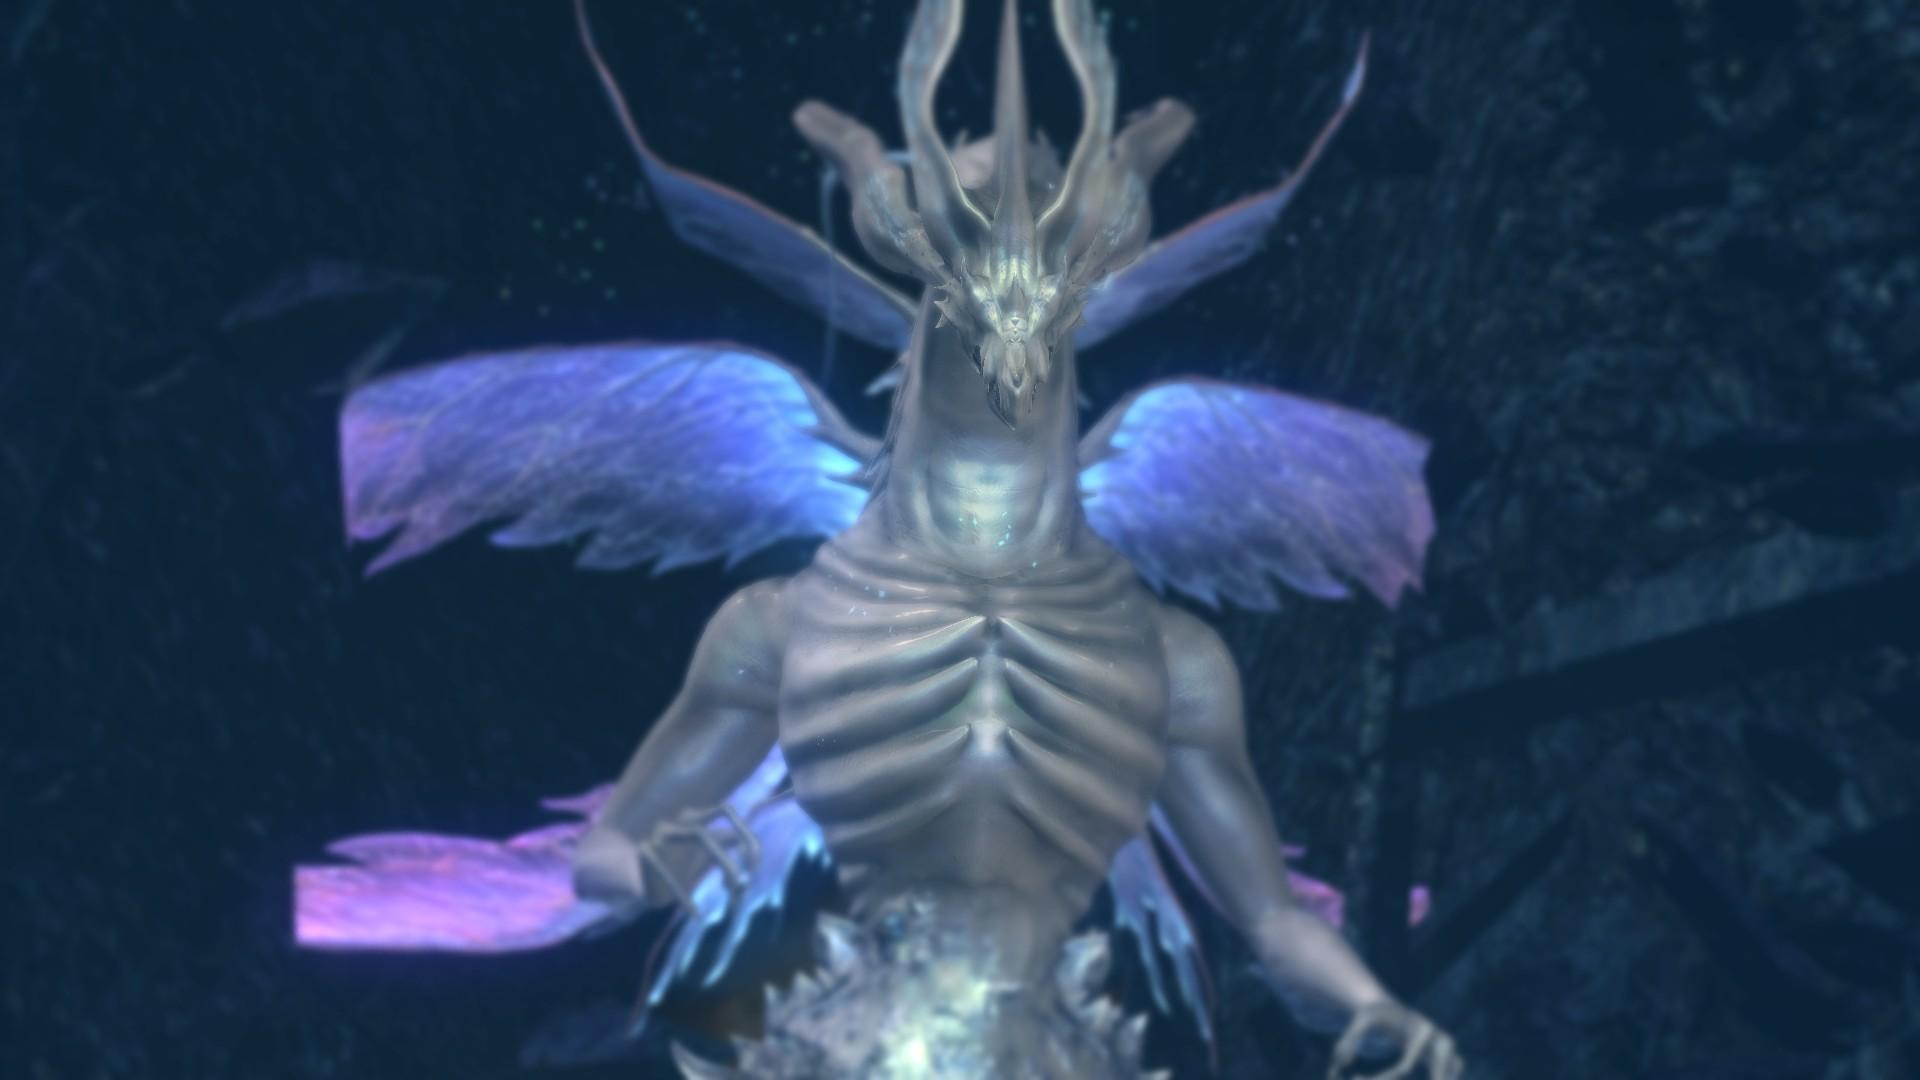 Dark Souls characters, ranked